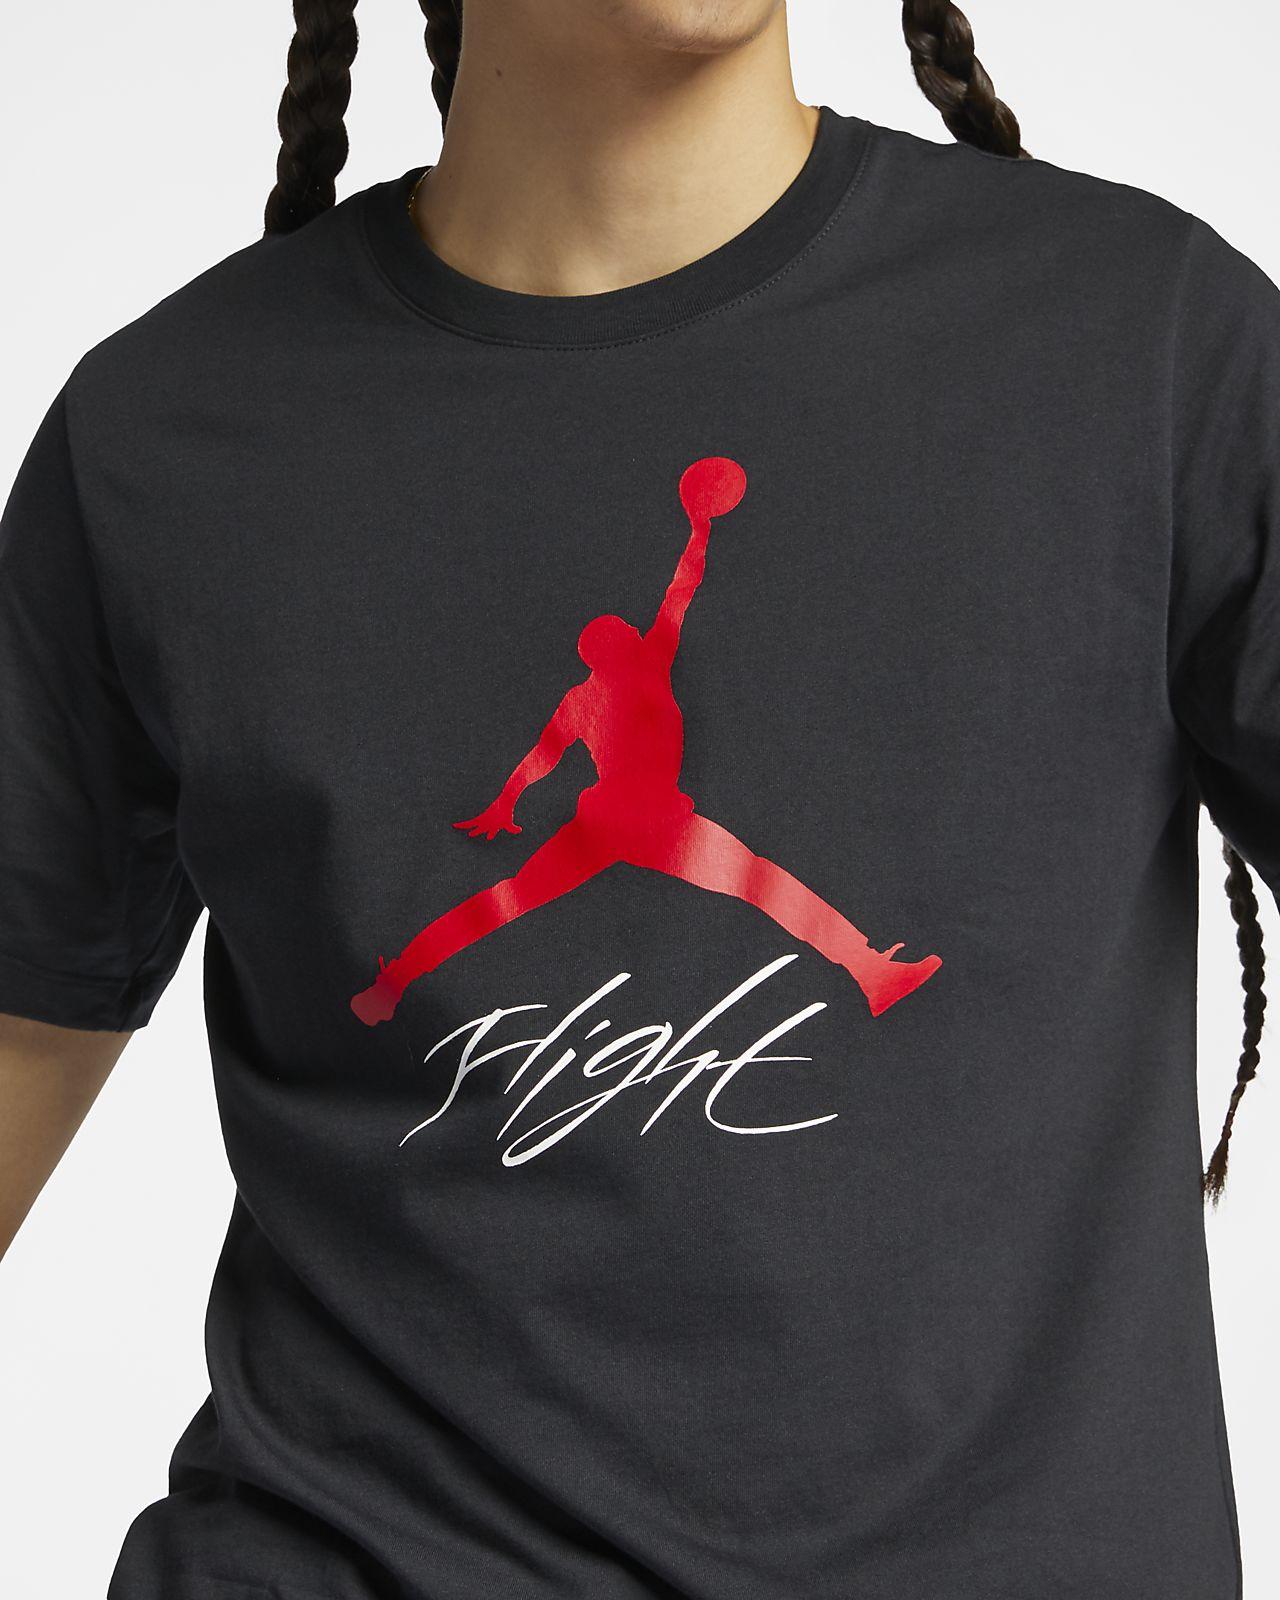 c82eeecdf80d Jordan Jumpman Flight Men s T-Shirt. Nike.com